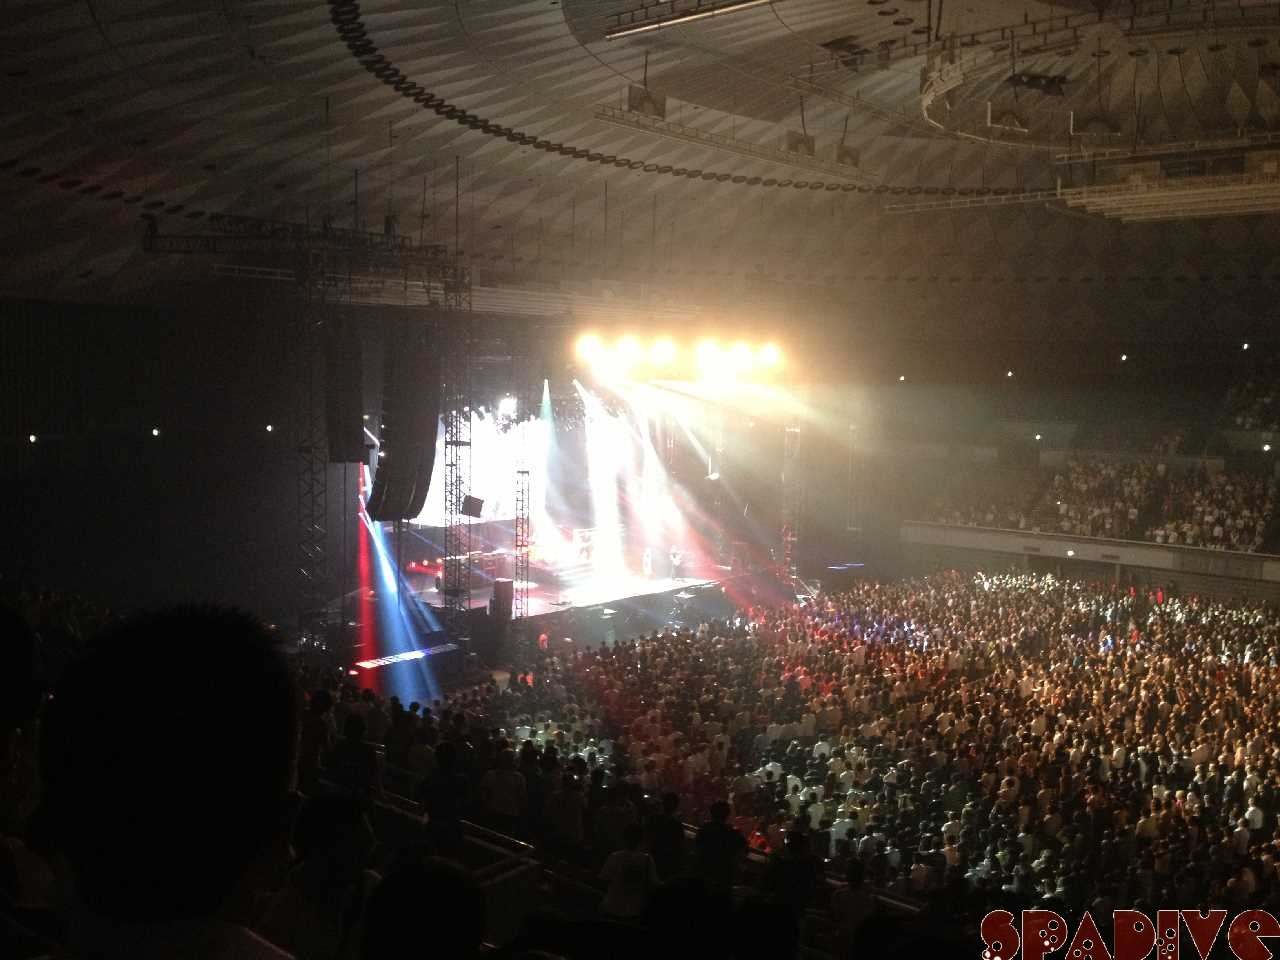 Van Halen ライブ Japan Tour 2013 6/24大阪中央体育館